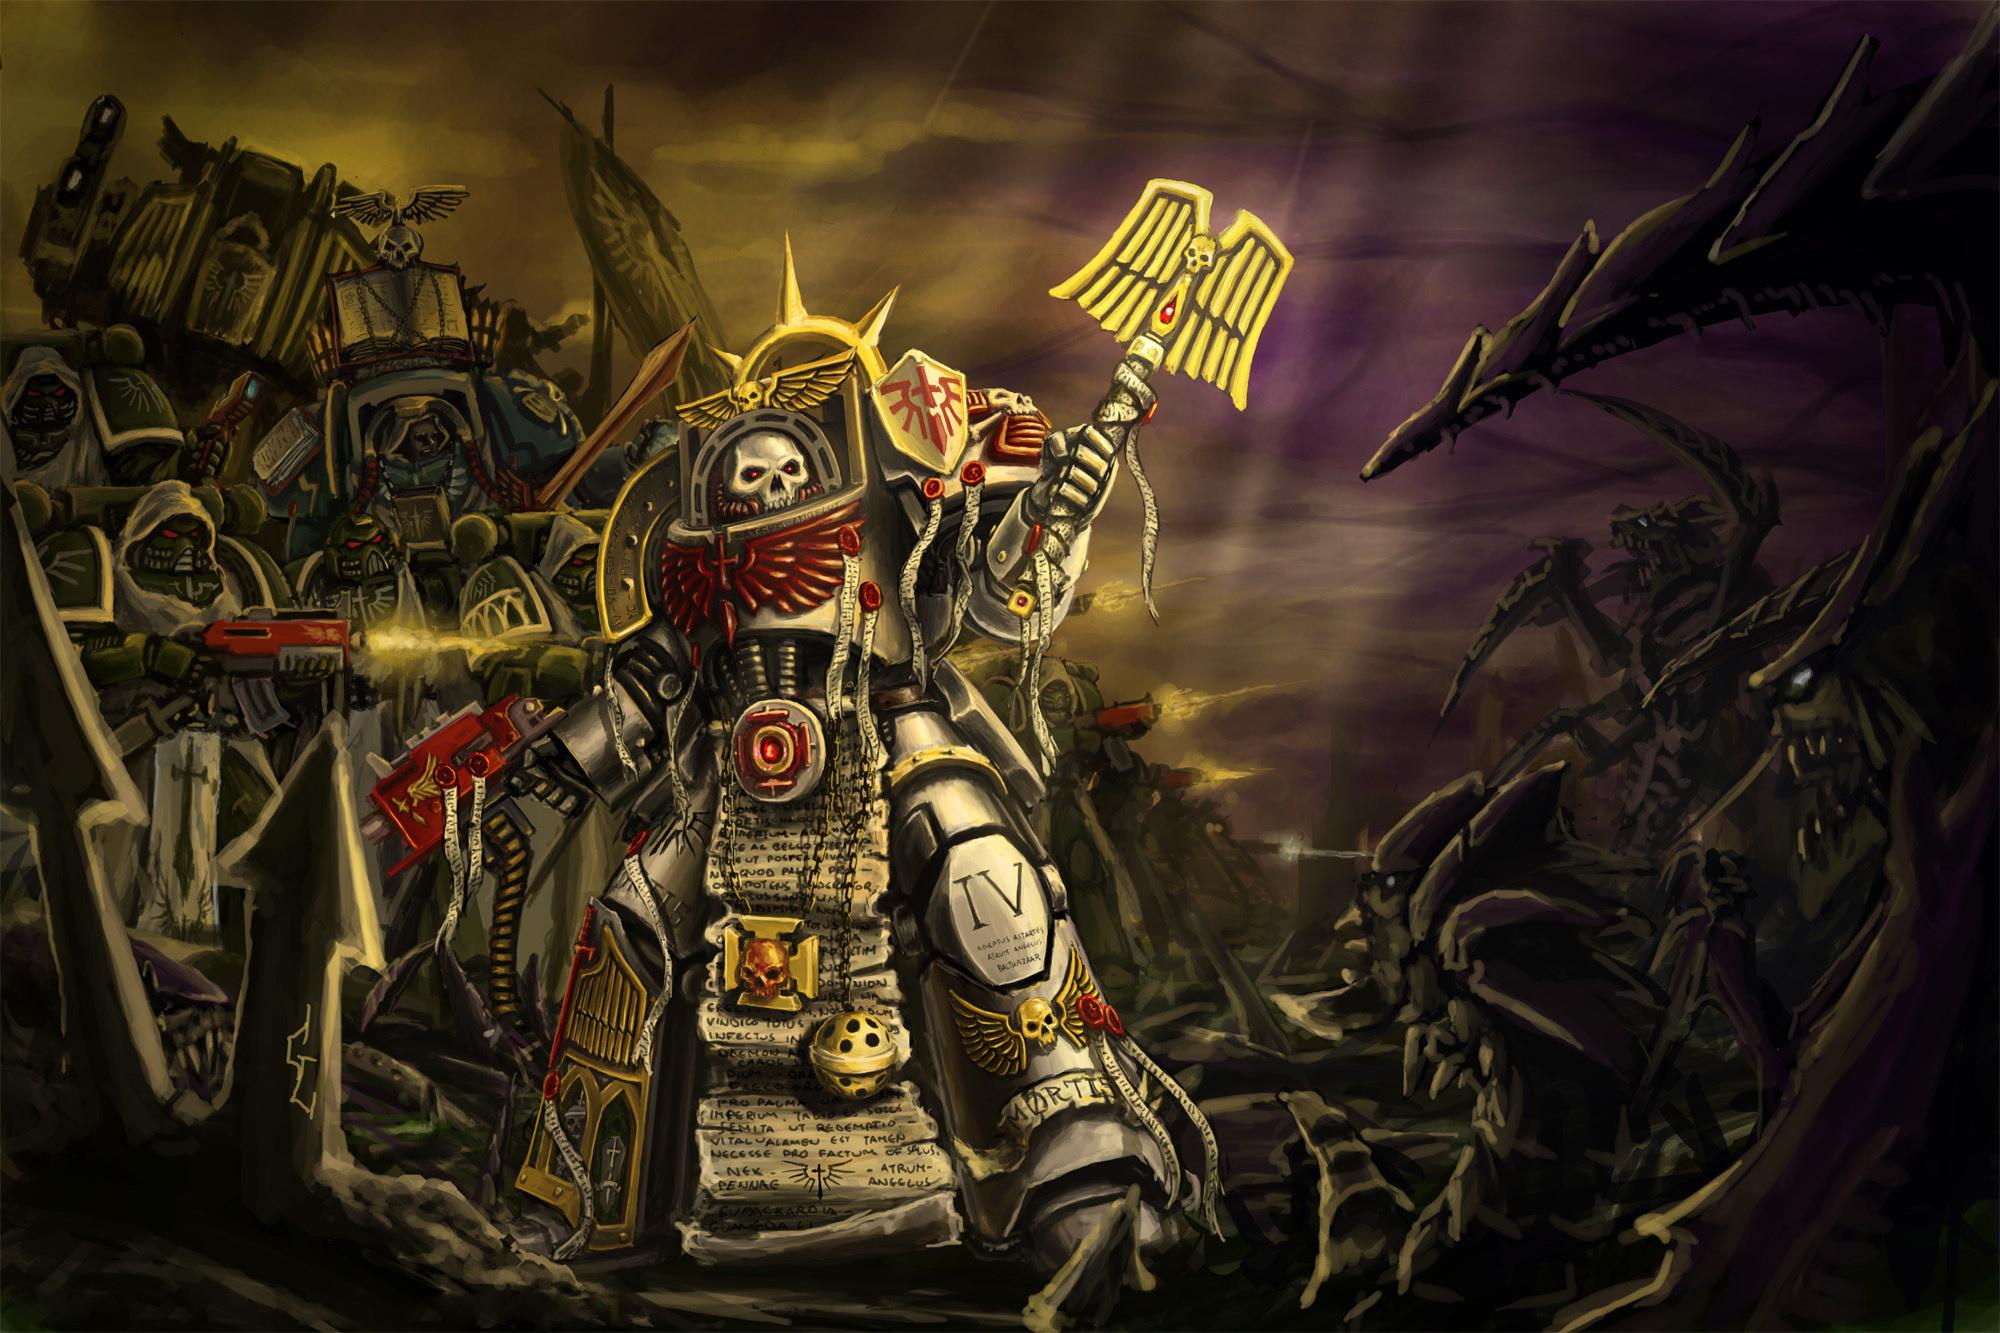 Warhammer dark angels, the chaplain, the soldiers, space marine, tyranids  wallpaper